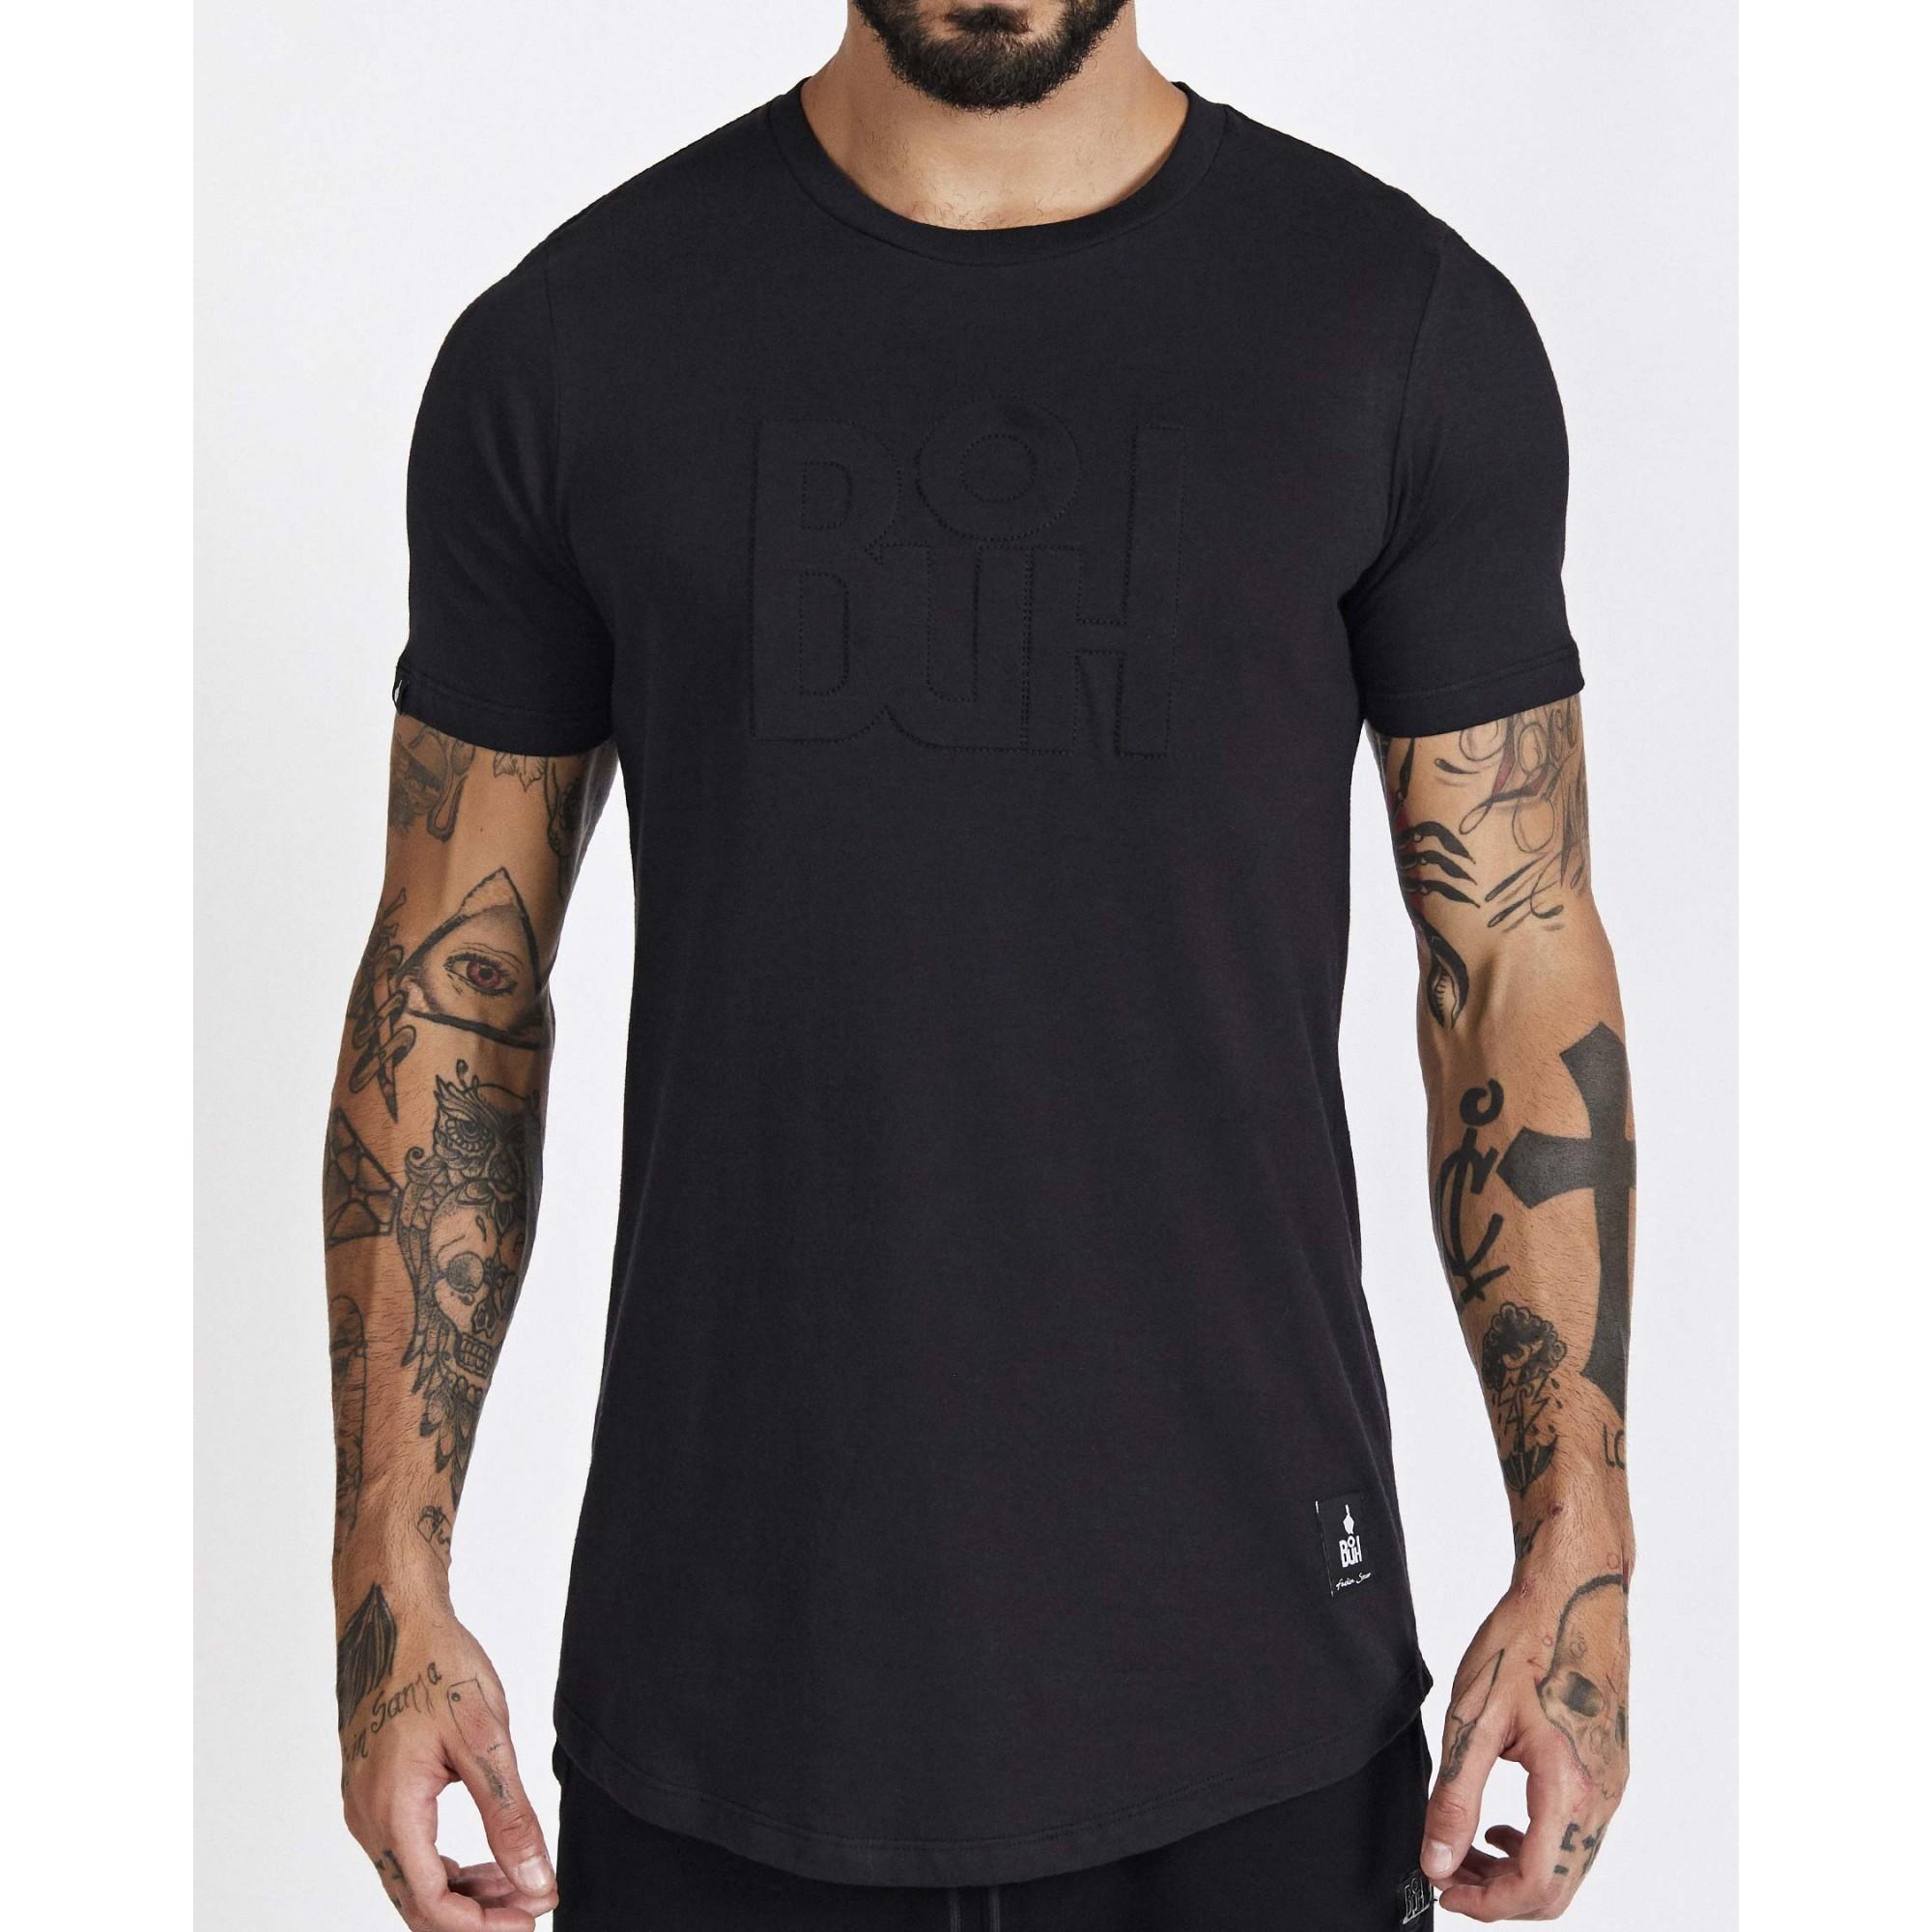 Camiseta Buh Relevo Black